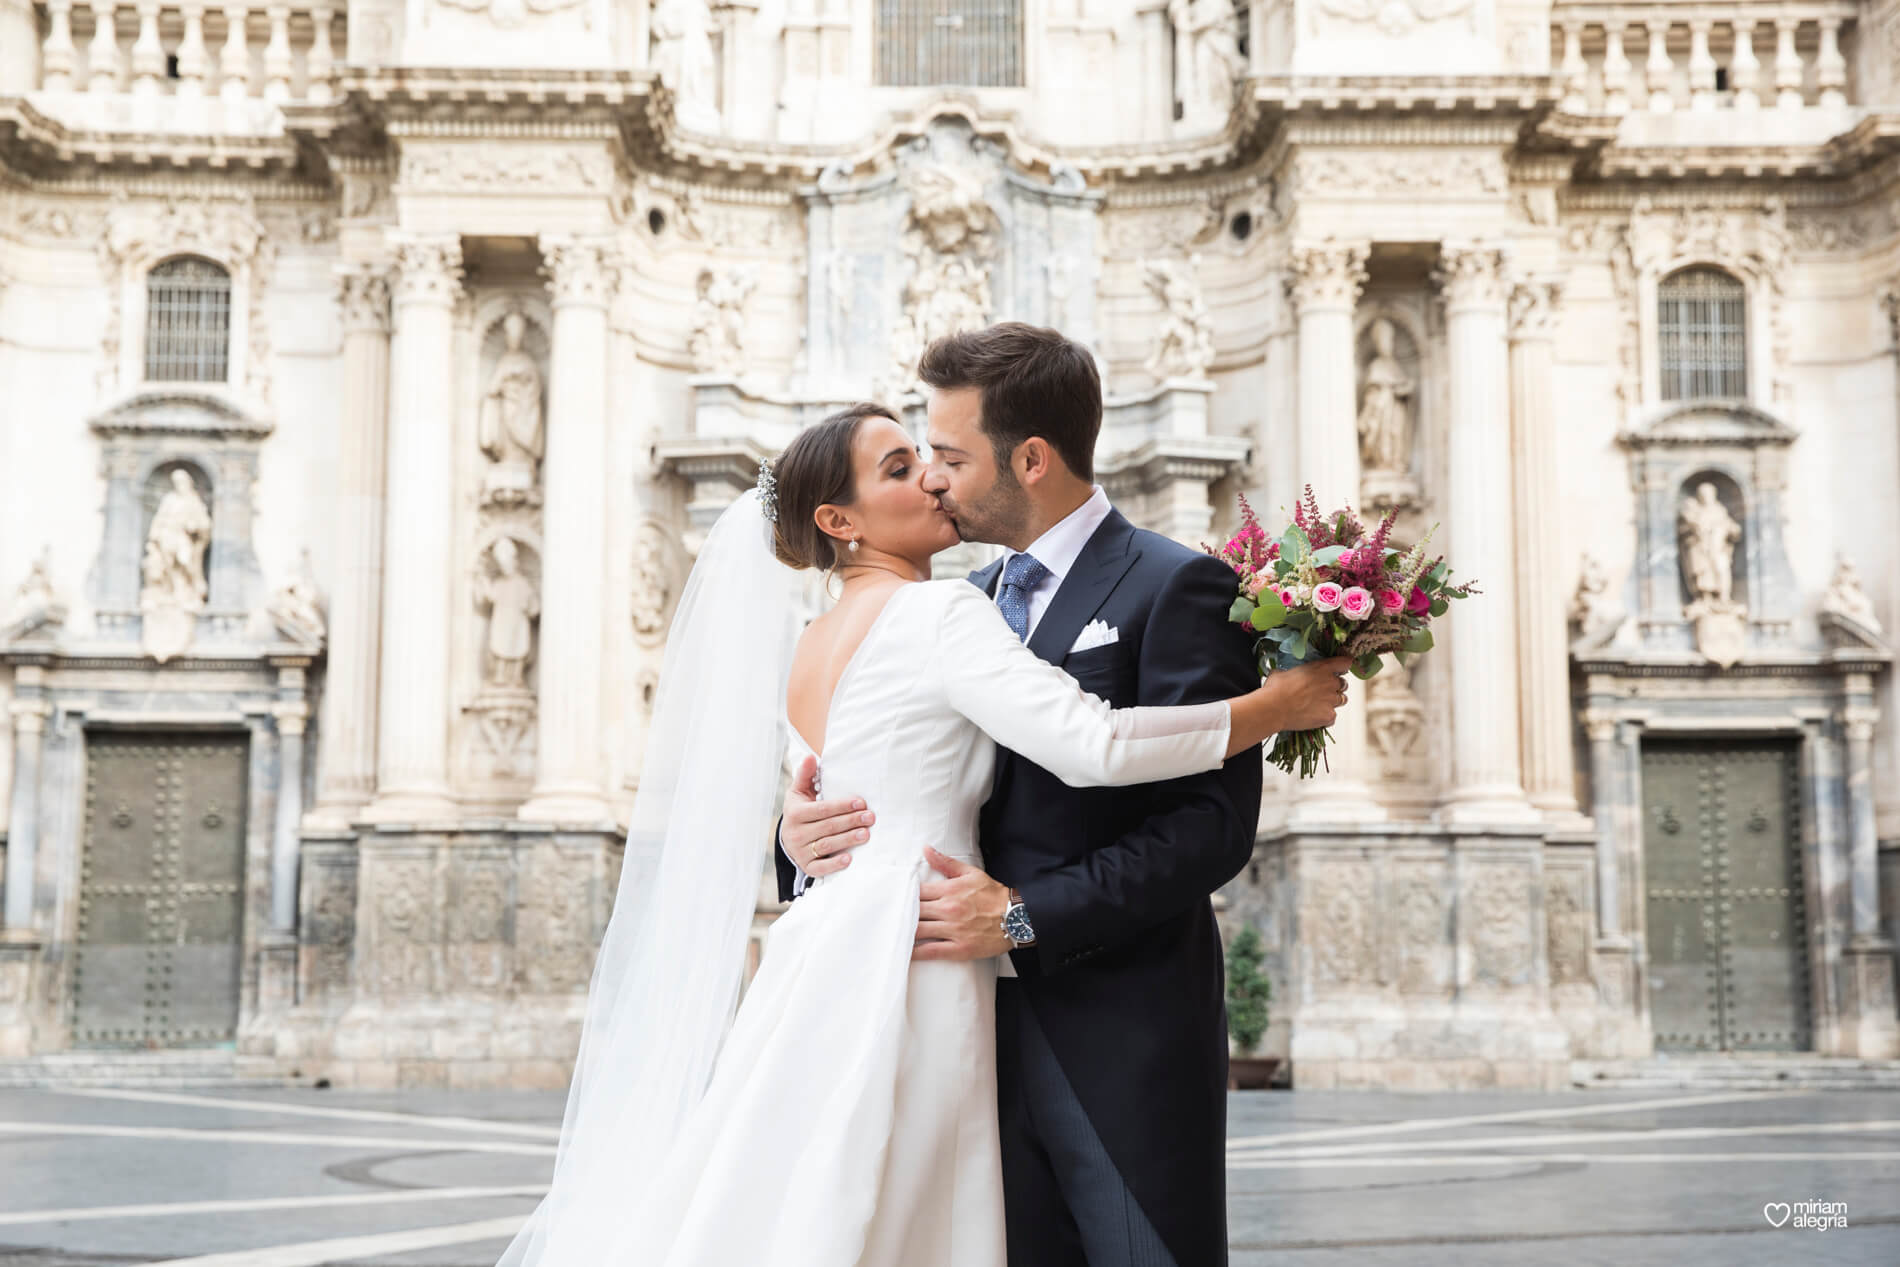 vestido-de-novia-paula-del-vas-miriam-alegria-fotografos-boda-murcia-85